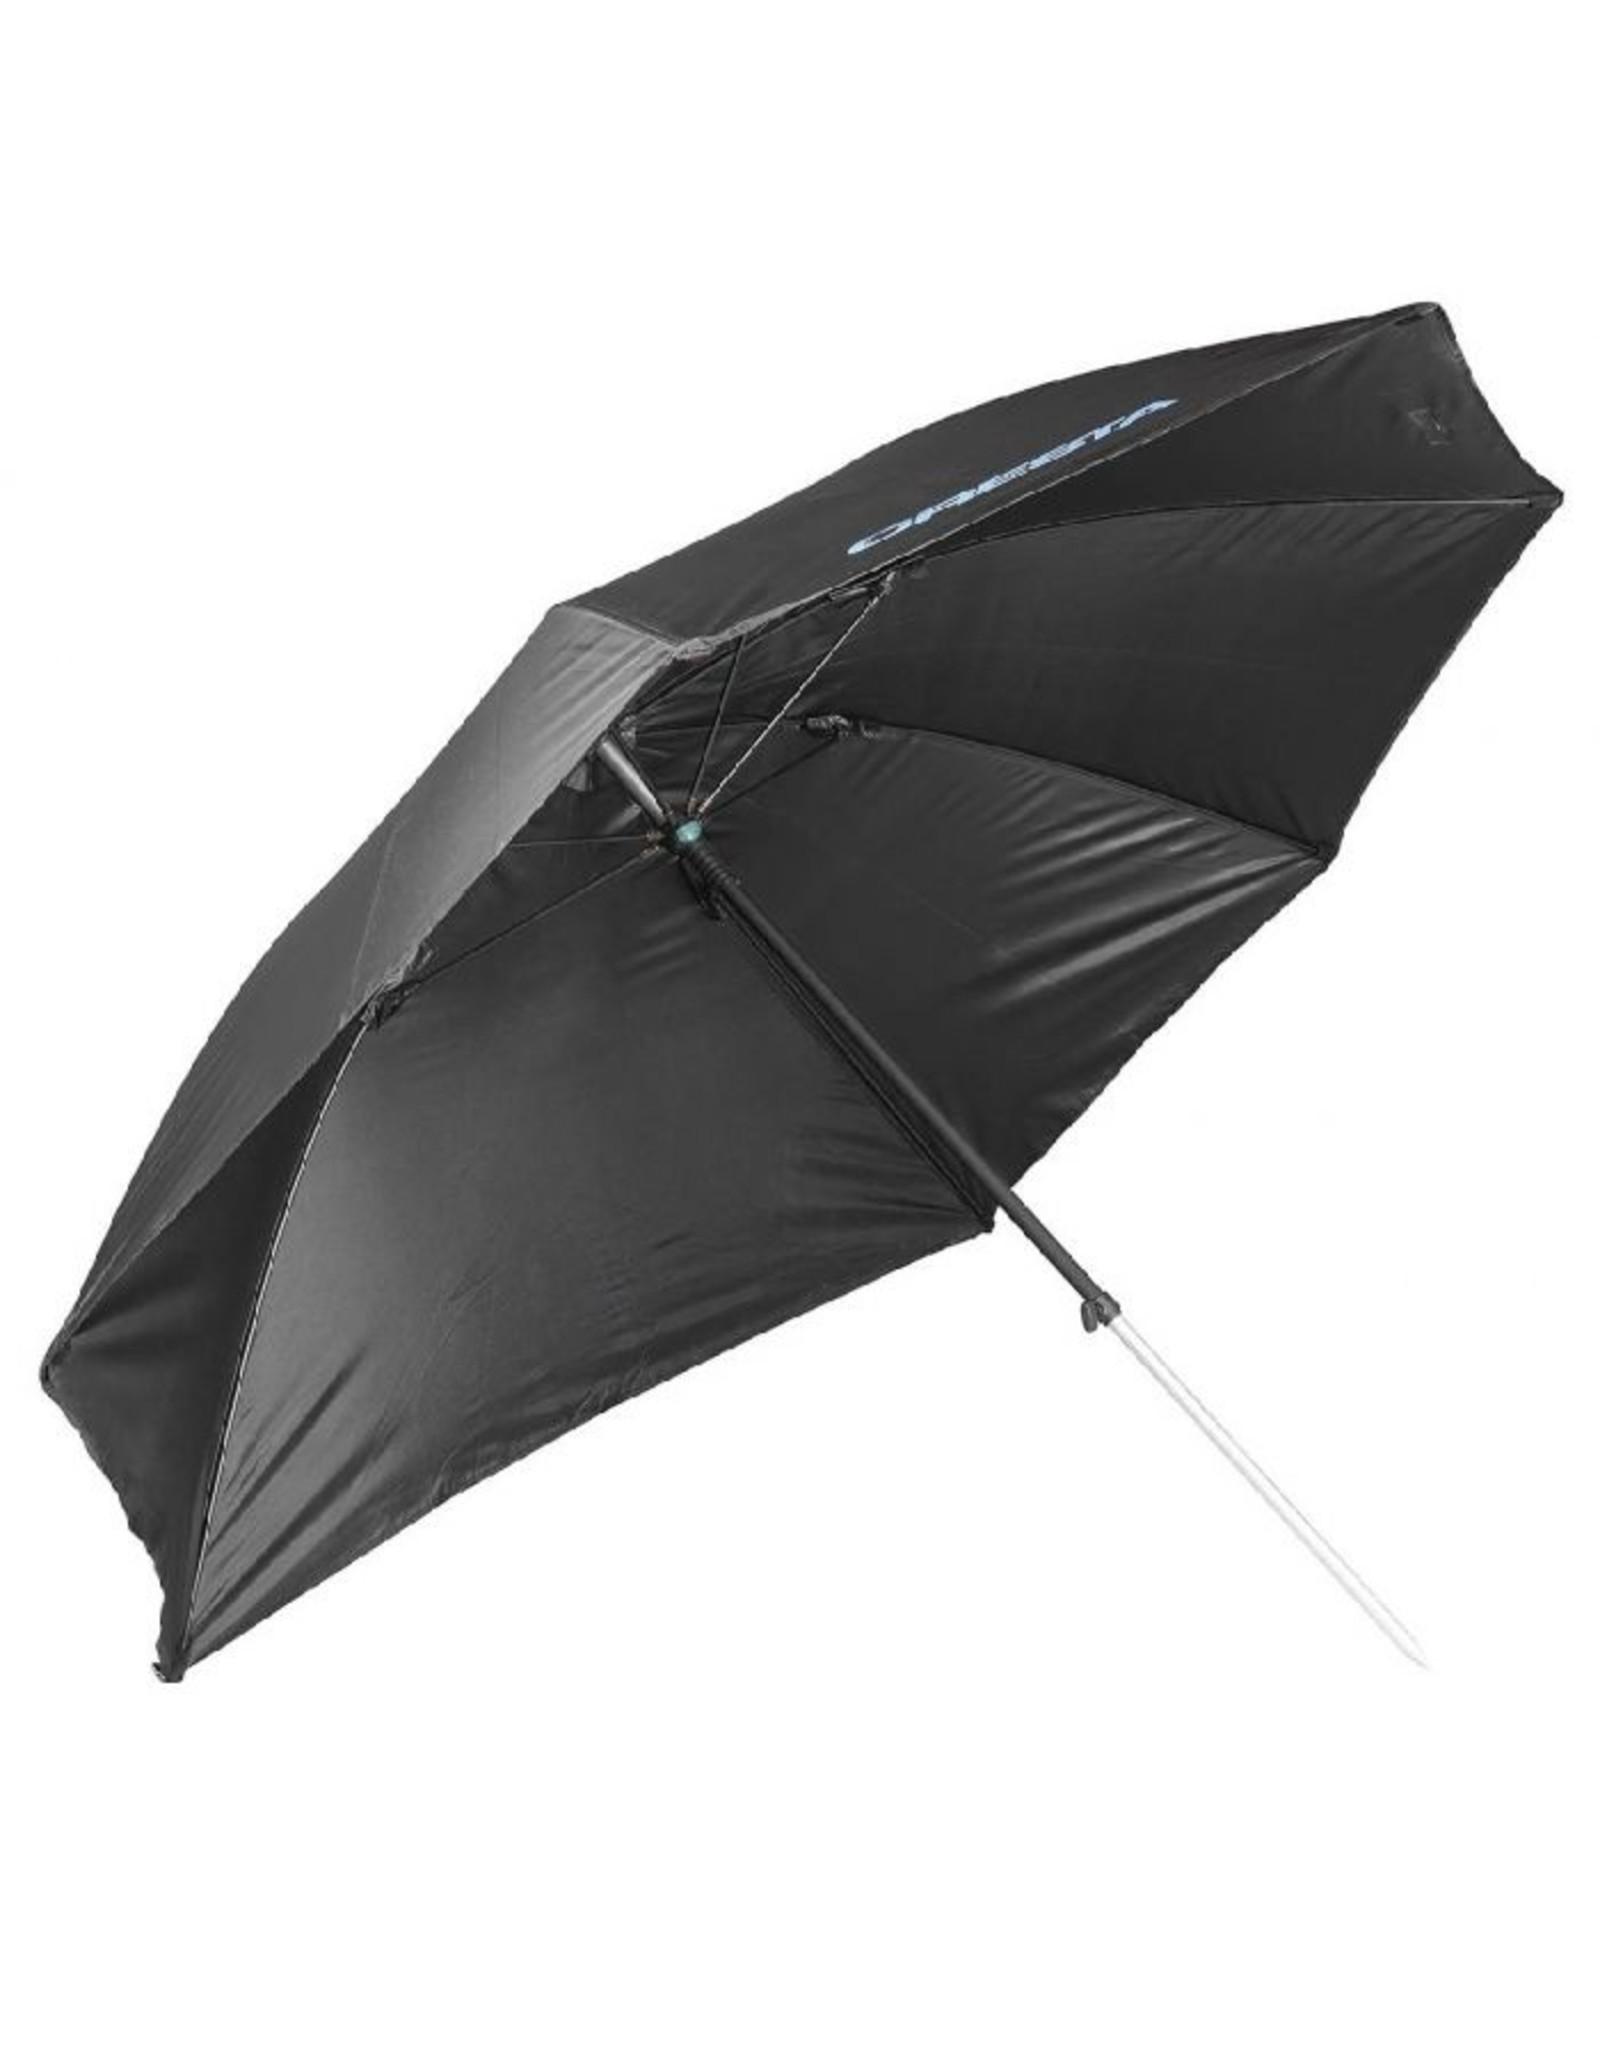 CREST Flat Side Umbrella Black 125Cm